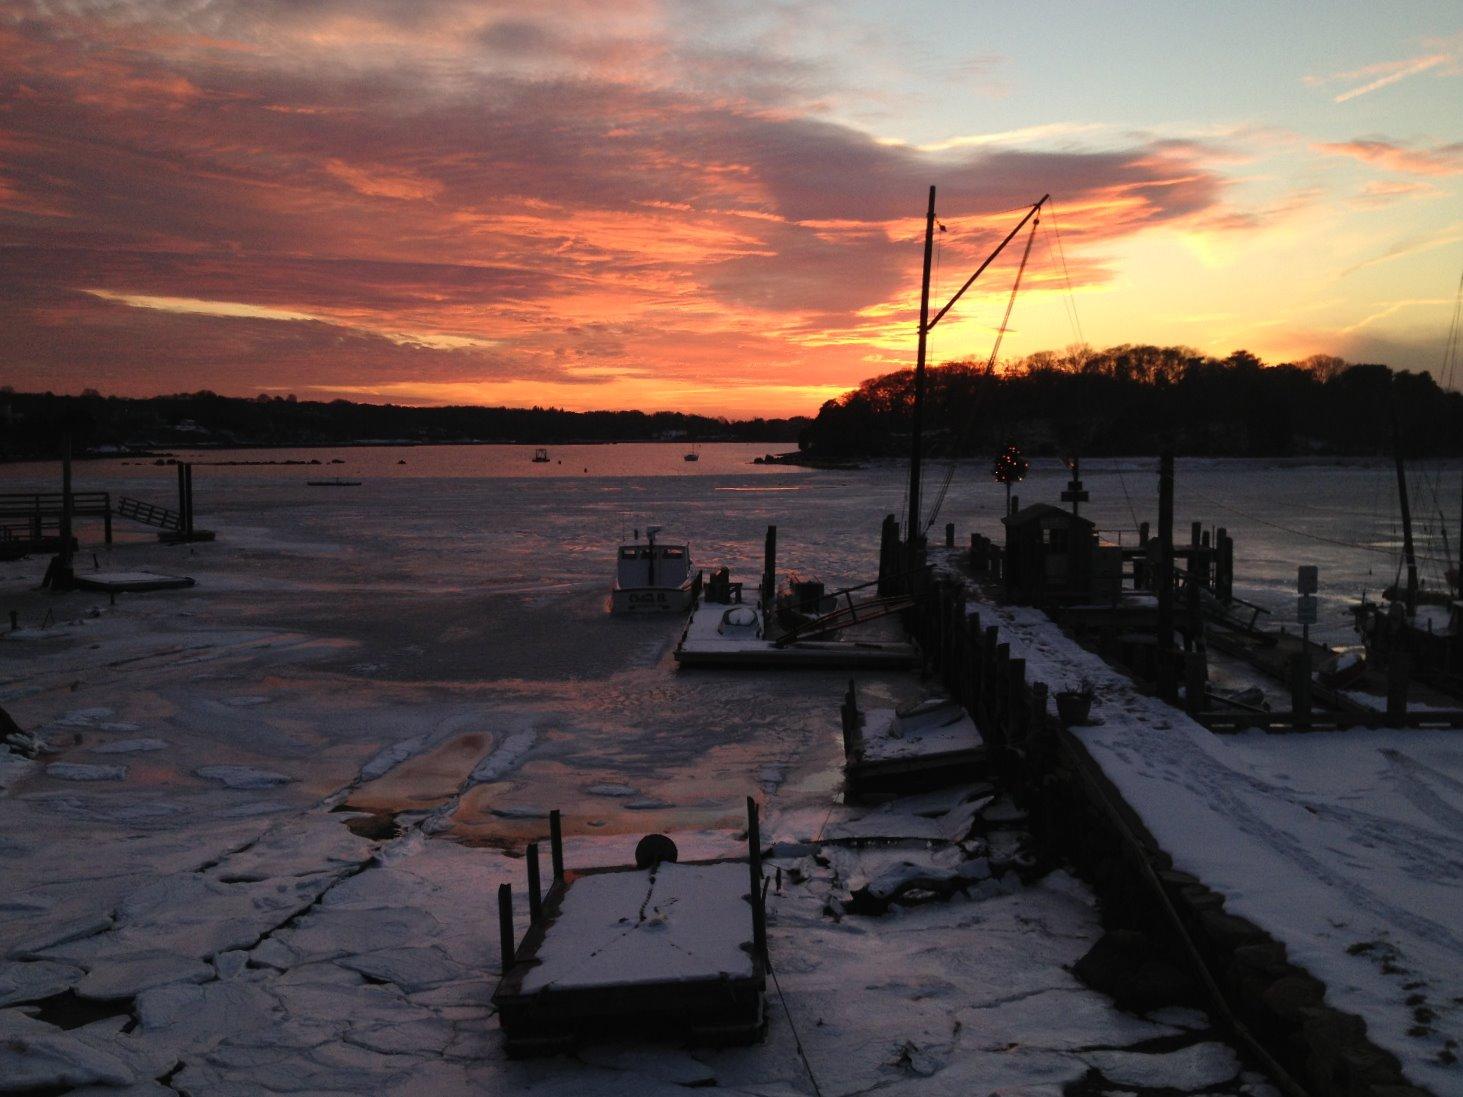 sunset winter 2014_edited.jpg